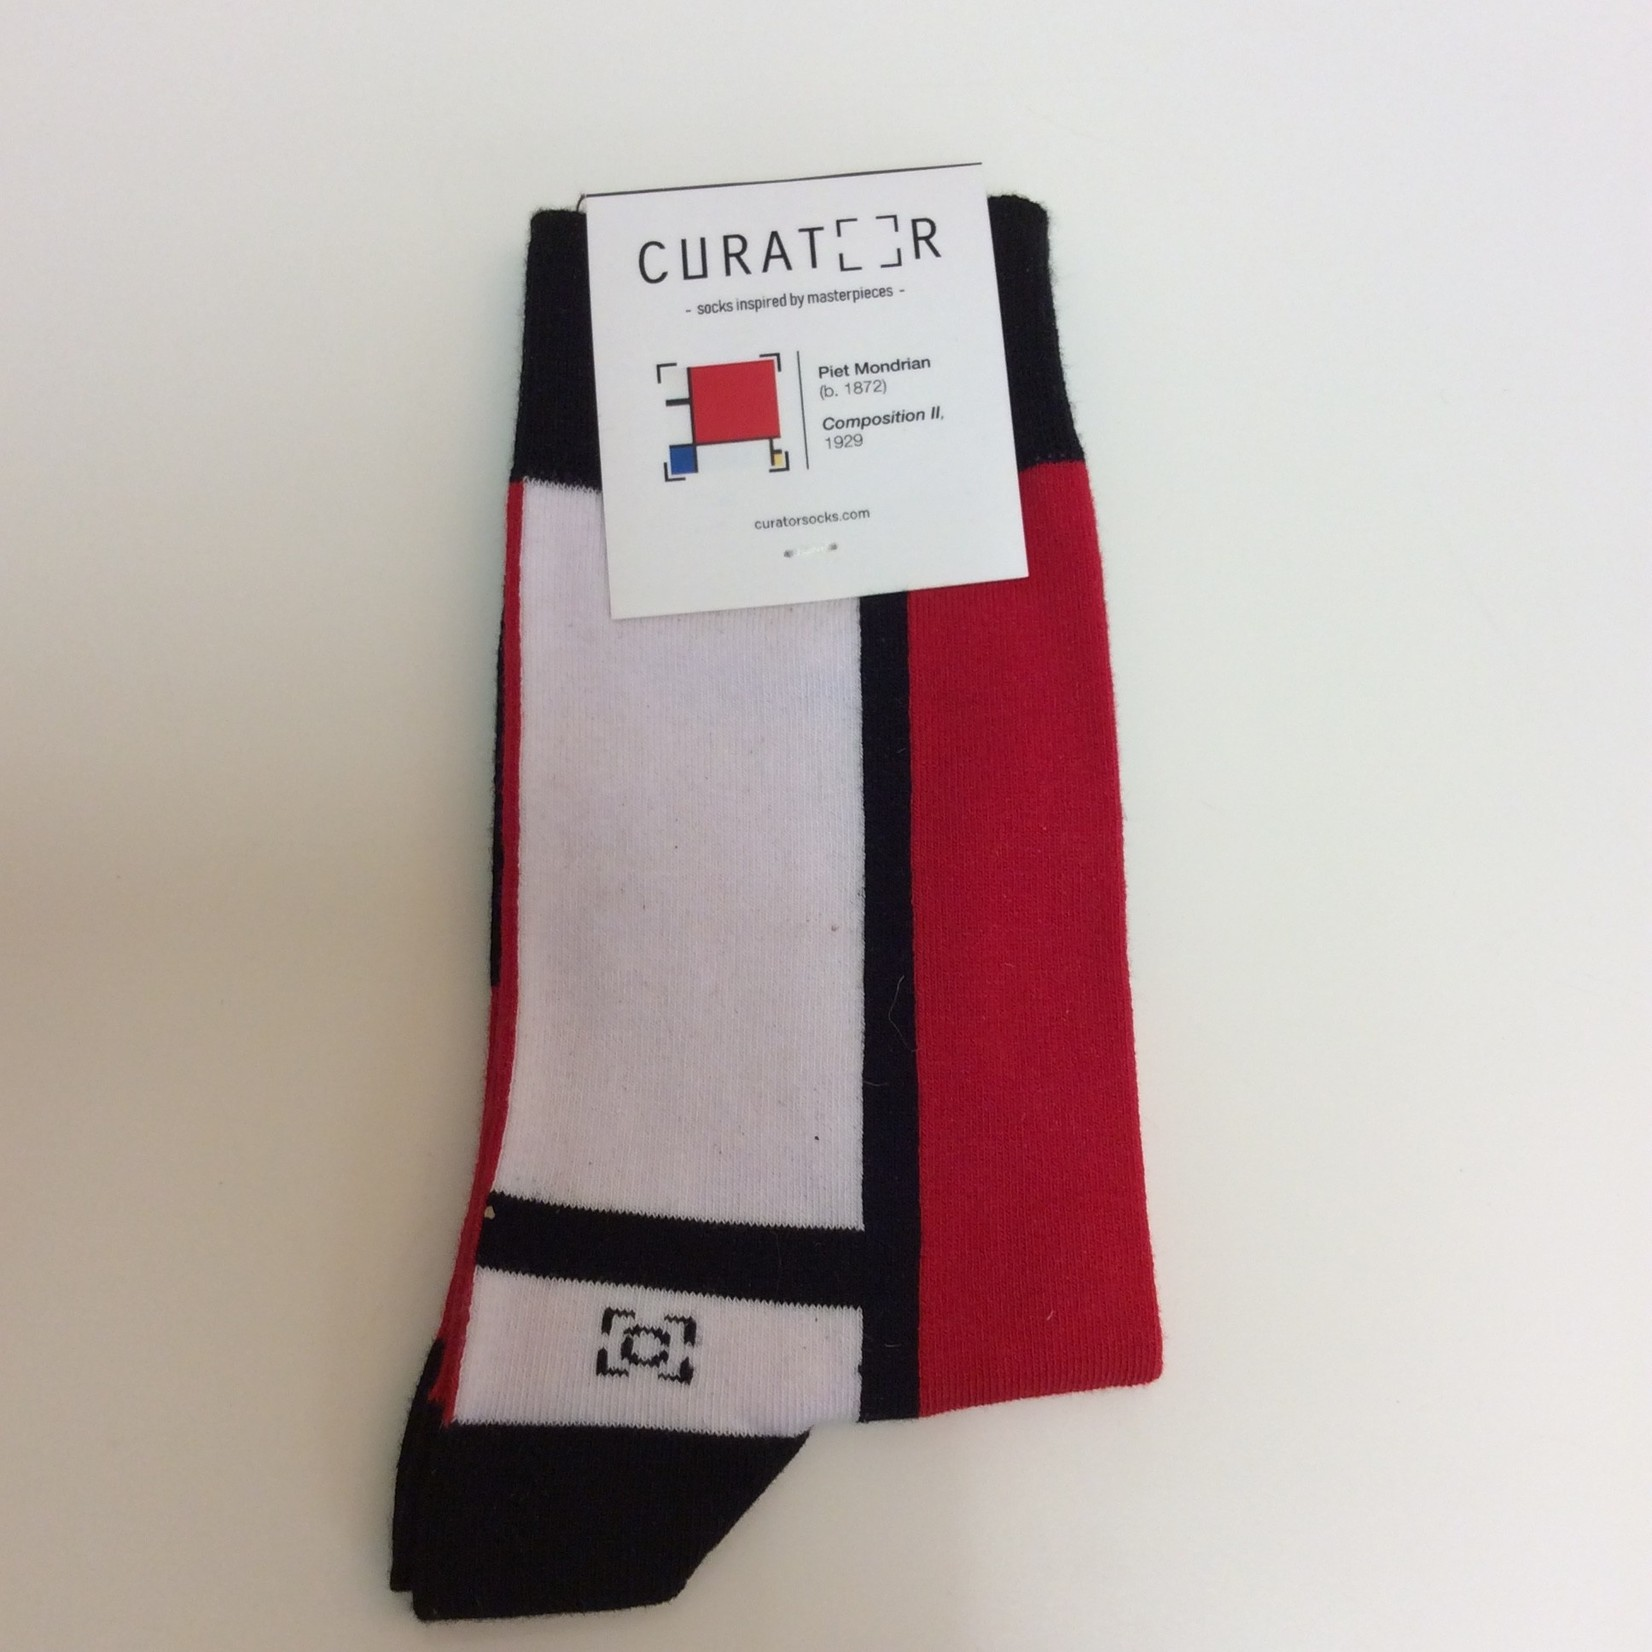 Curator Socks Composition II Socks